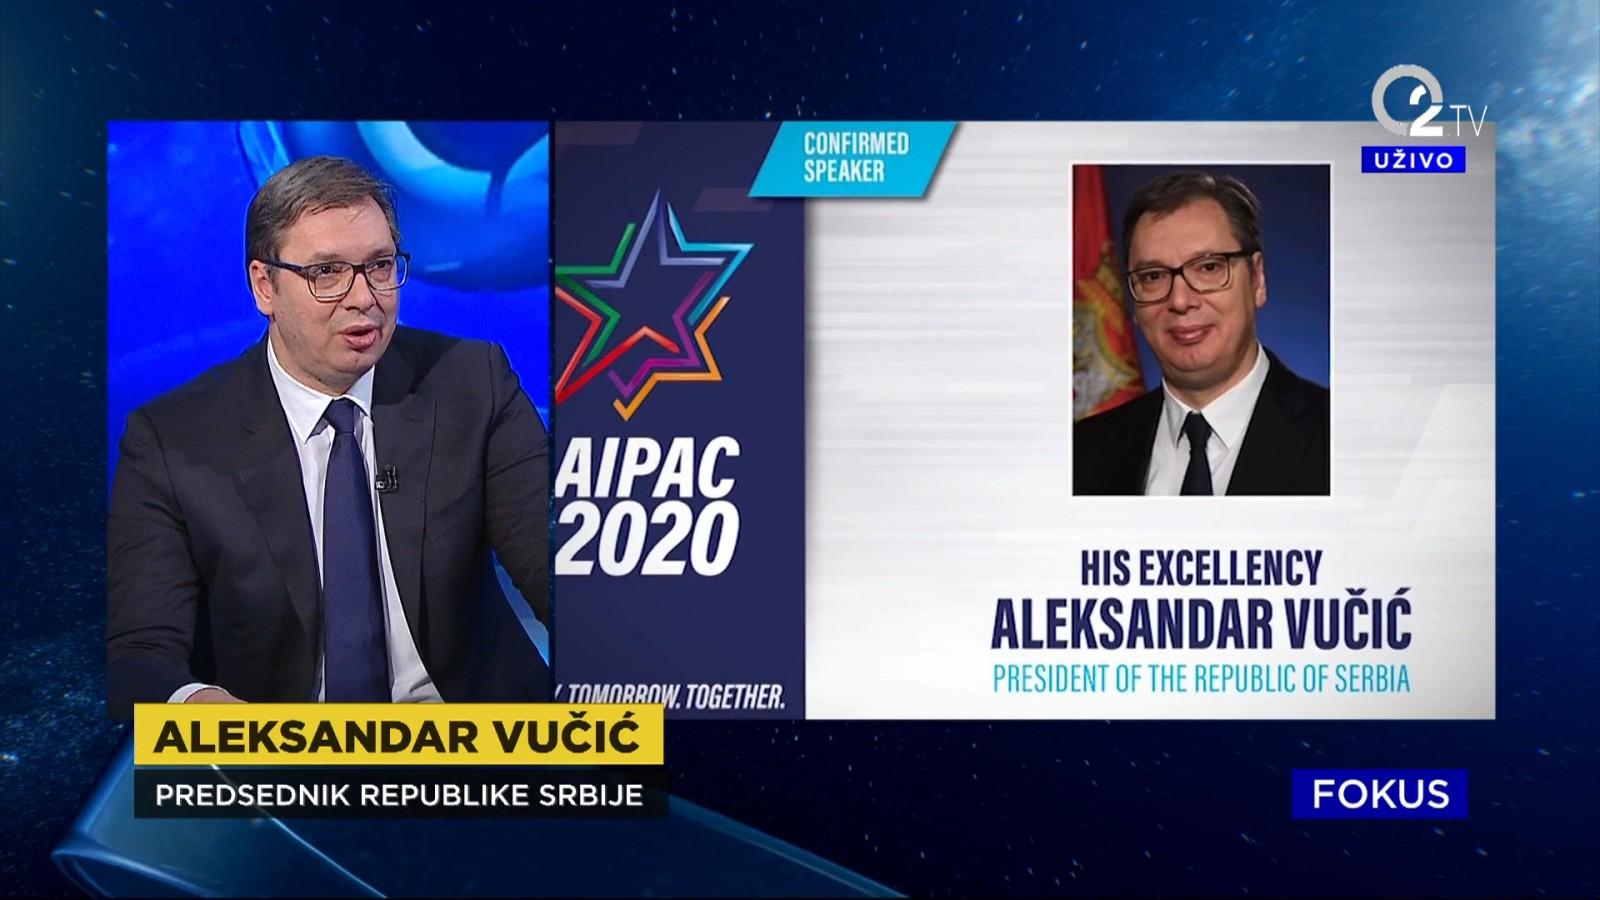 Predsednik Aleksandar Vucic o AIPAC-u.